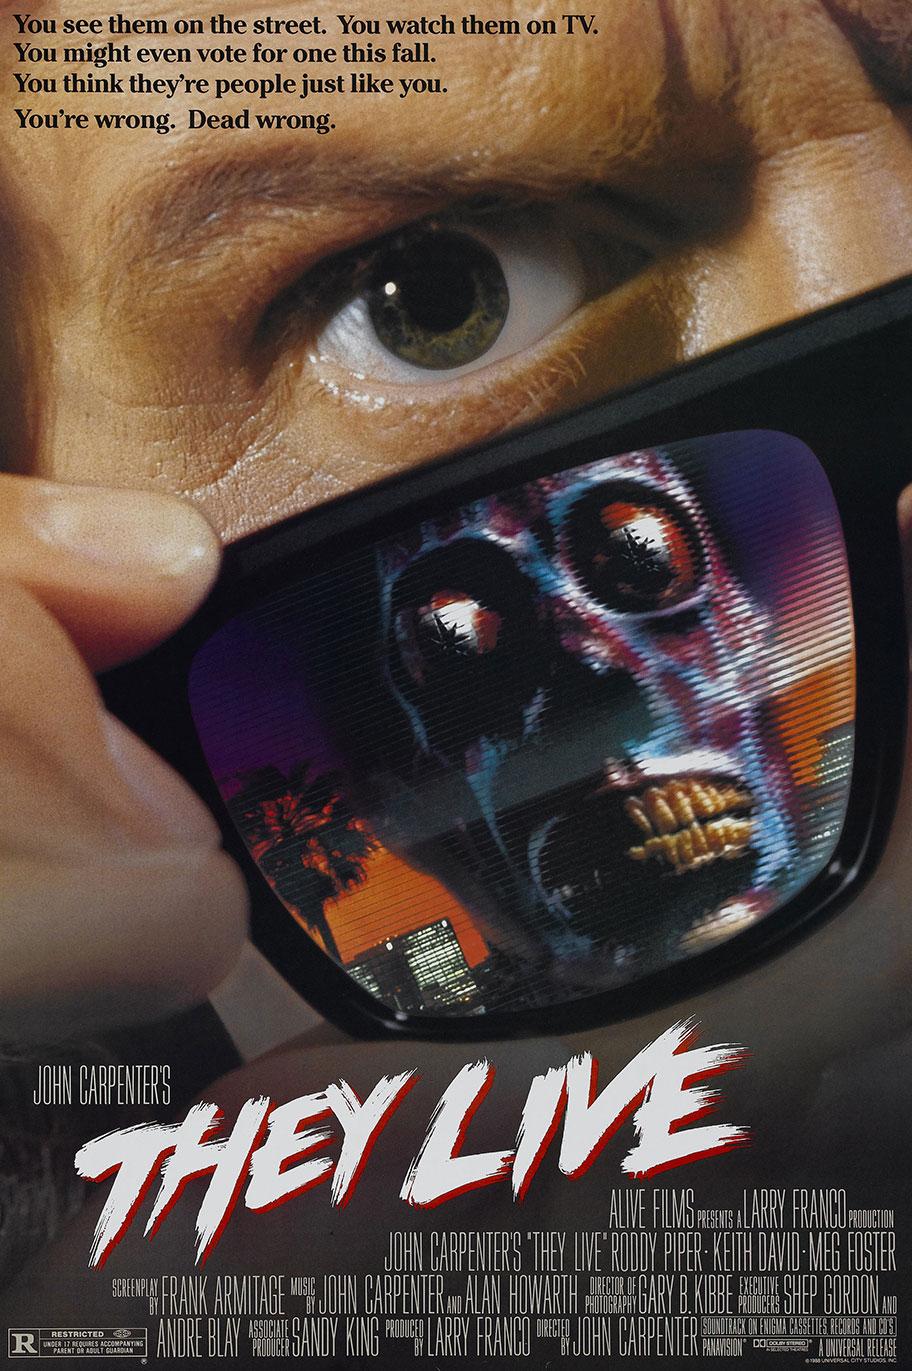 john-carpenter-they-live-poster.jpg